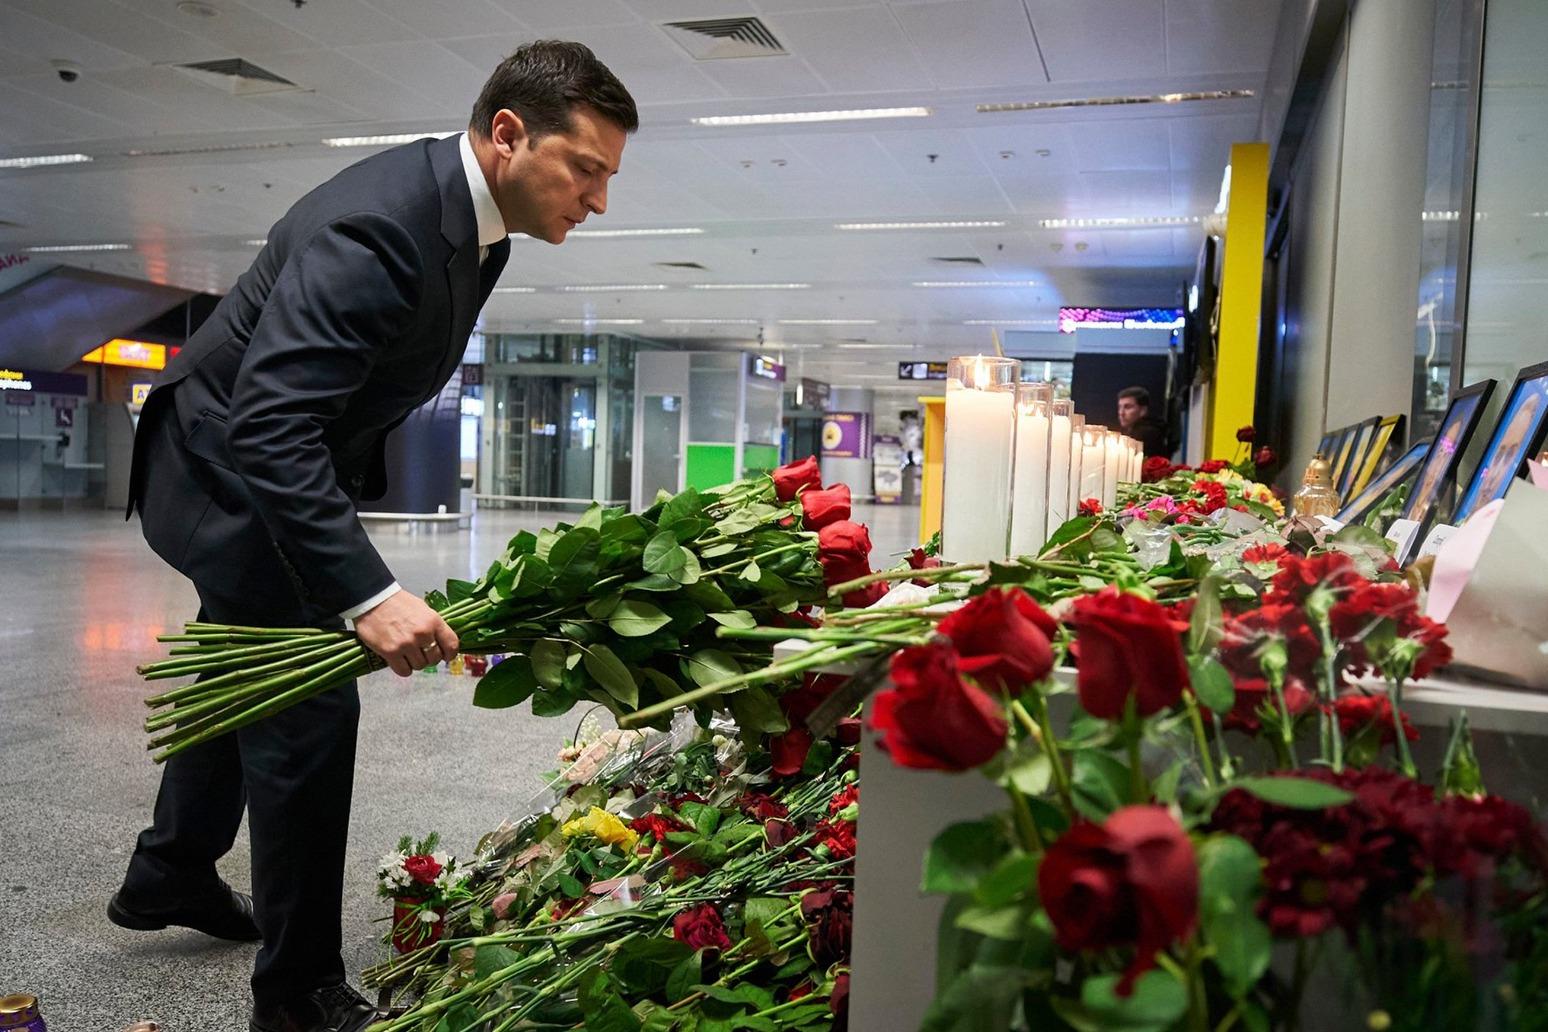 UKRAINIAN PLANE NEVER CALLED FOR HELP BEFORE CRASH, SAY IRAN INVESTIGATORS